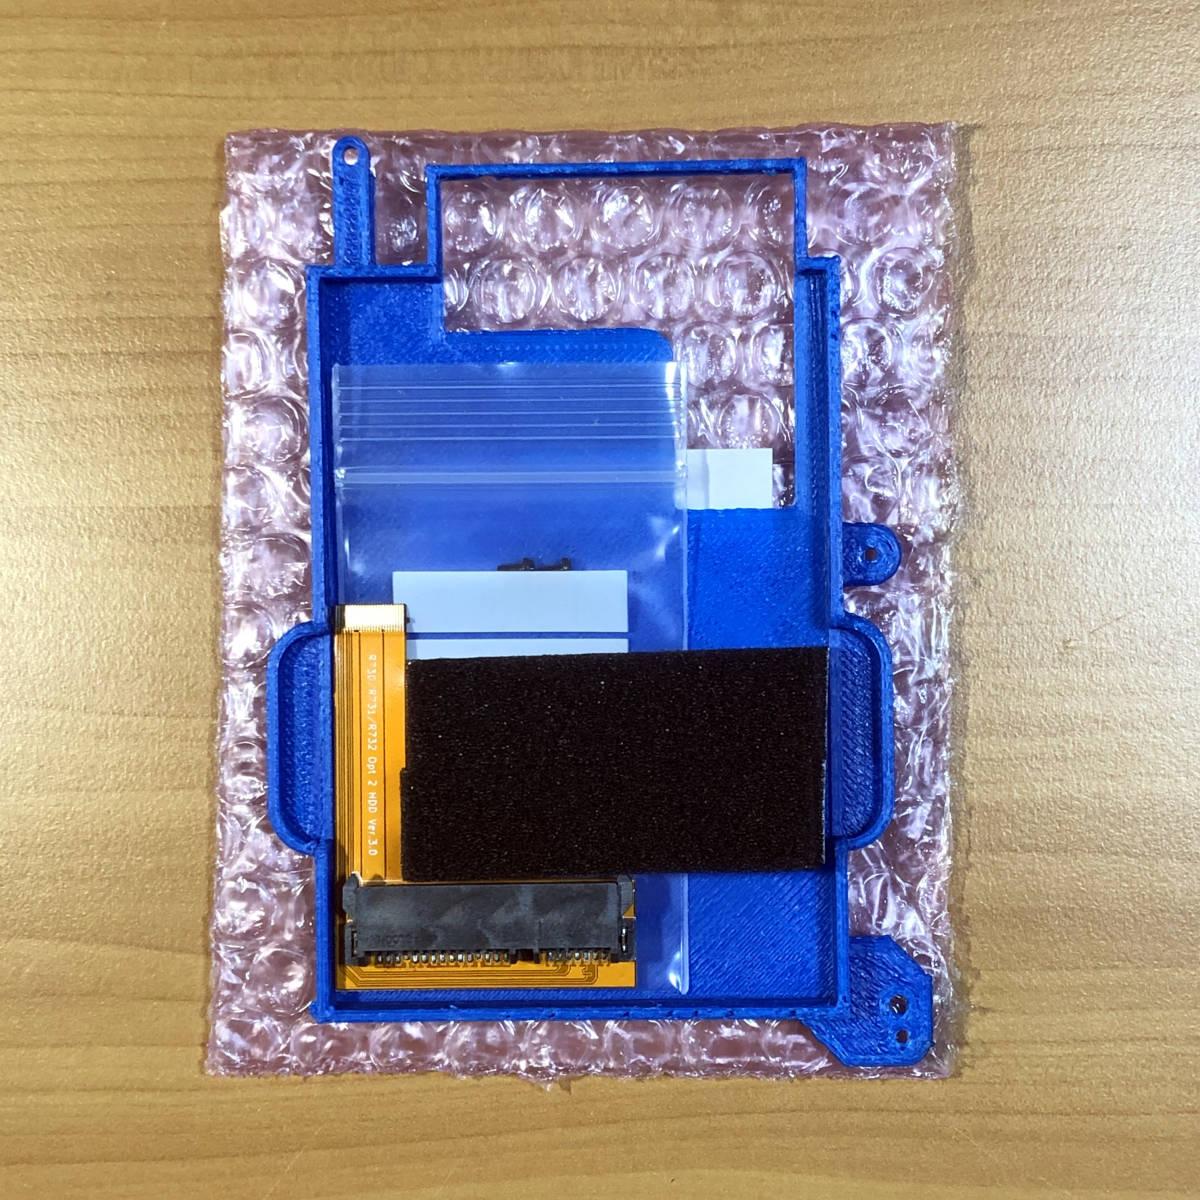 dynabook R730/R731/R732 光学ドライブ非搭載モデル用HDD/SSD増設キット_画像3